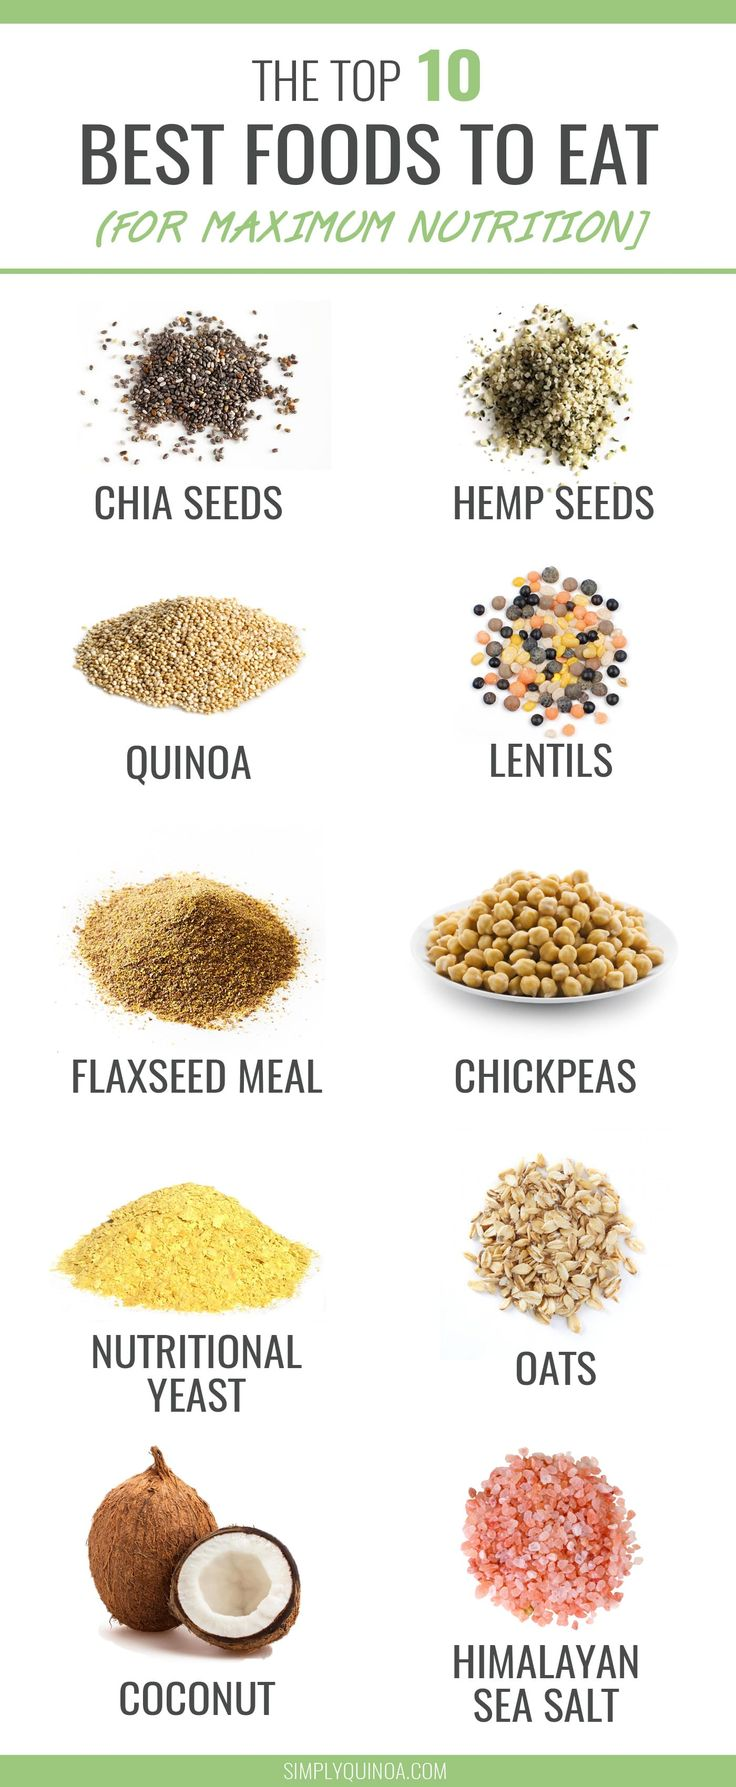 Best Foods For Gurd And Acid Reflux